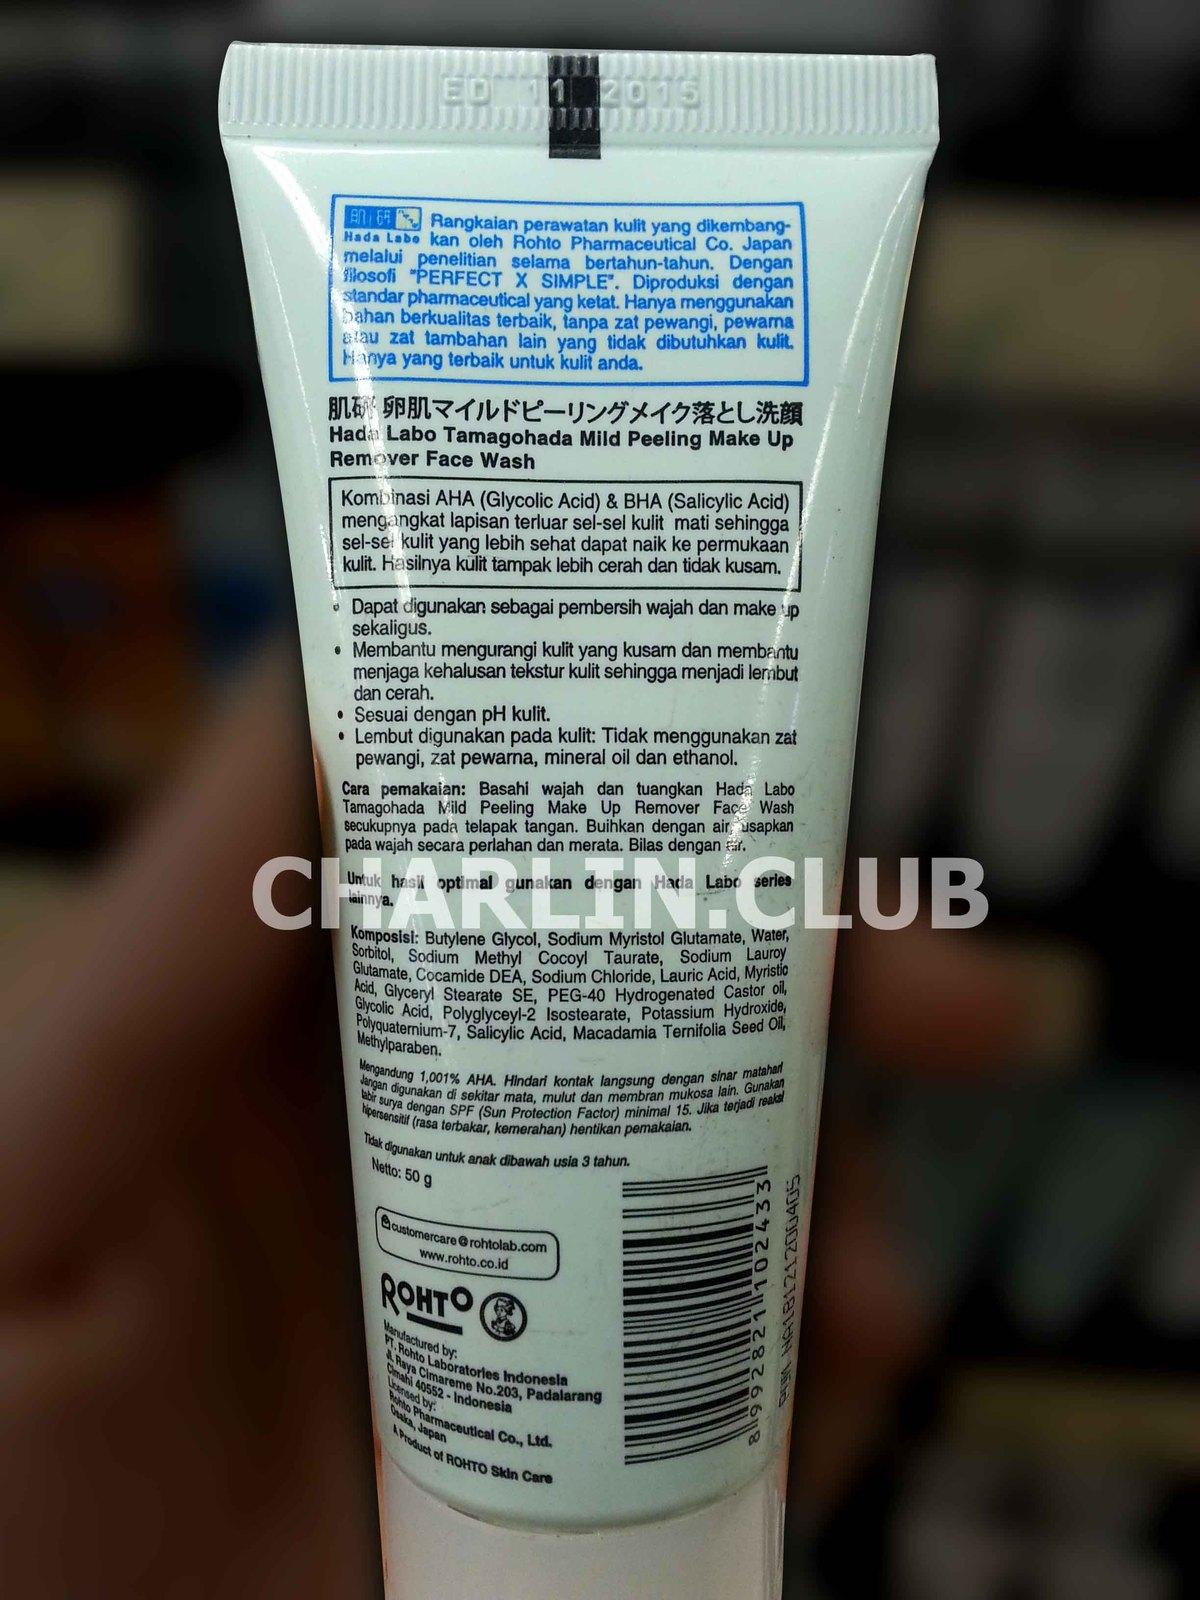 ... Hada Labo Tamagohada Mild Peeling Make Up Remover Face Wash 50gr